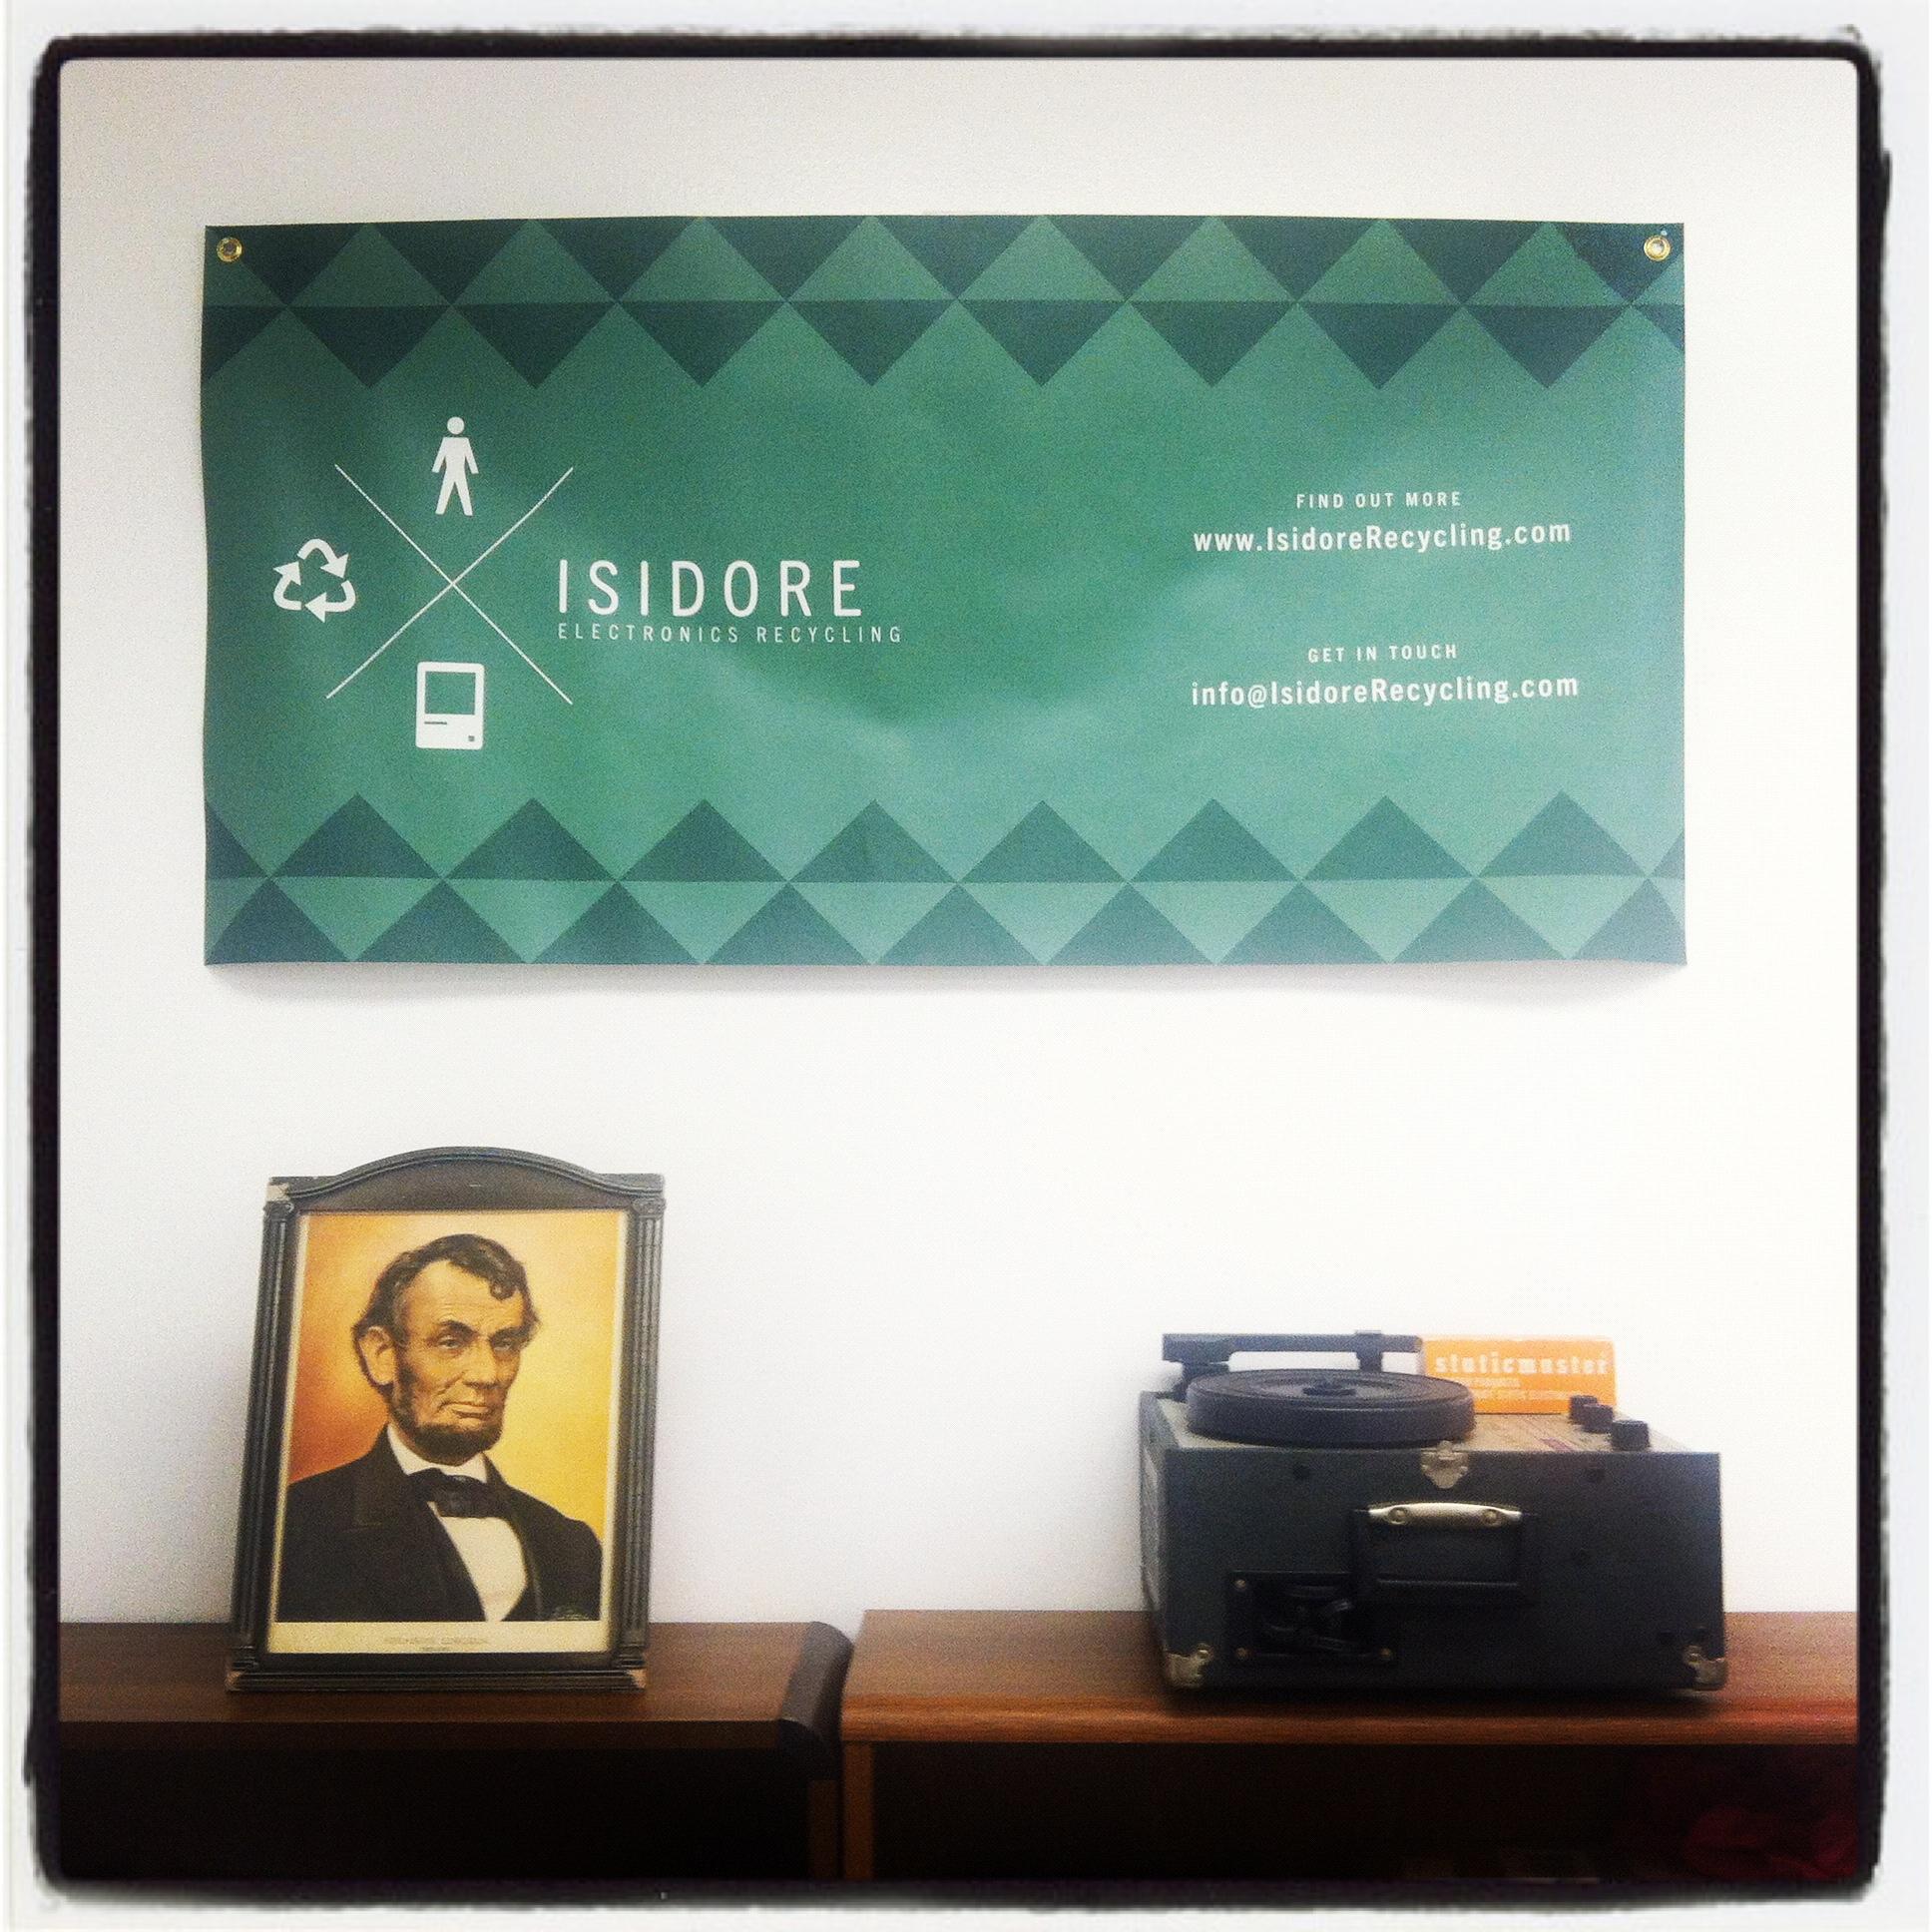 Isidore_Office.JPG